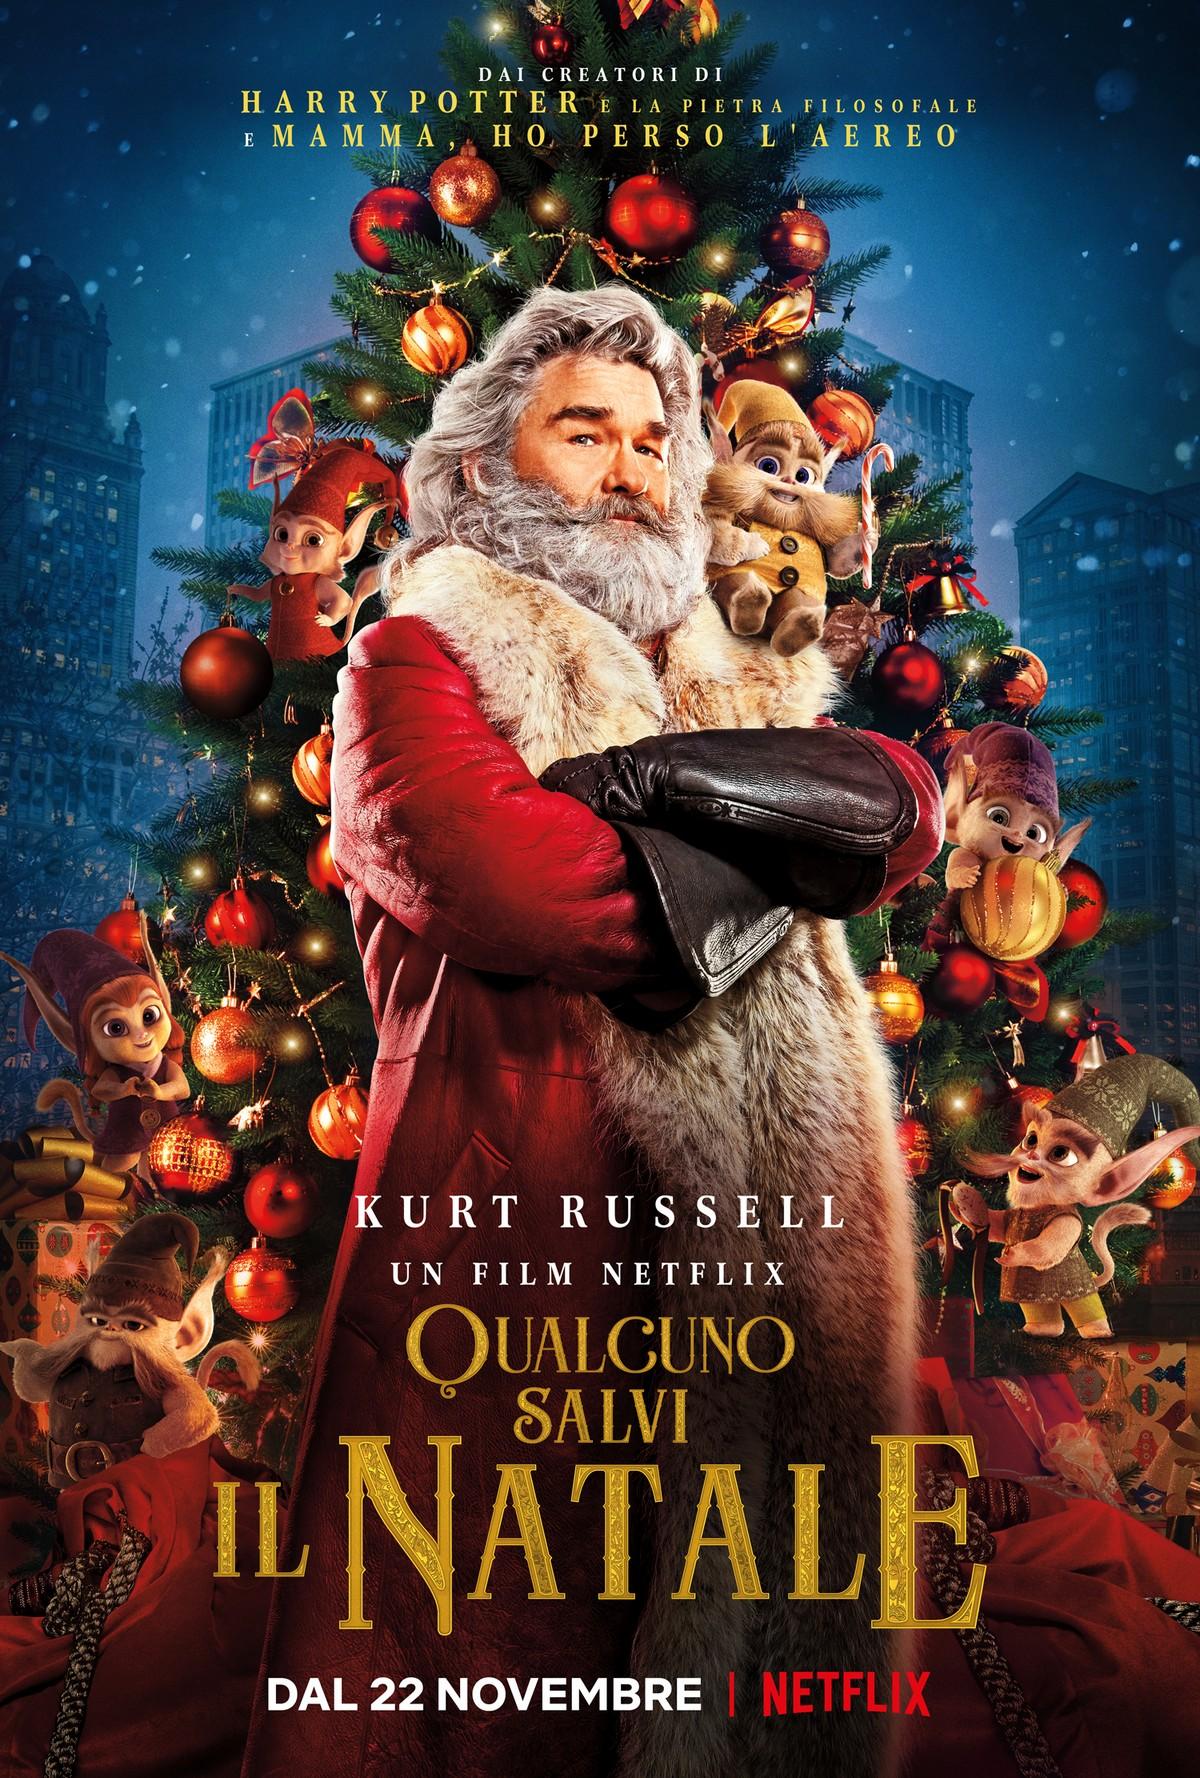 Qualcuno salvi il Natale film Netflix 2018